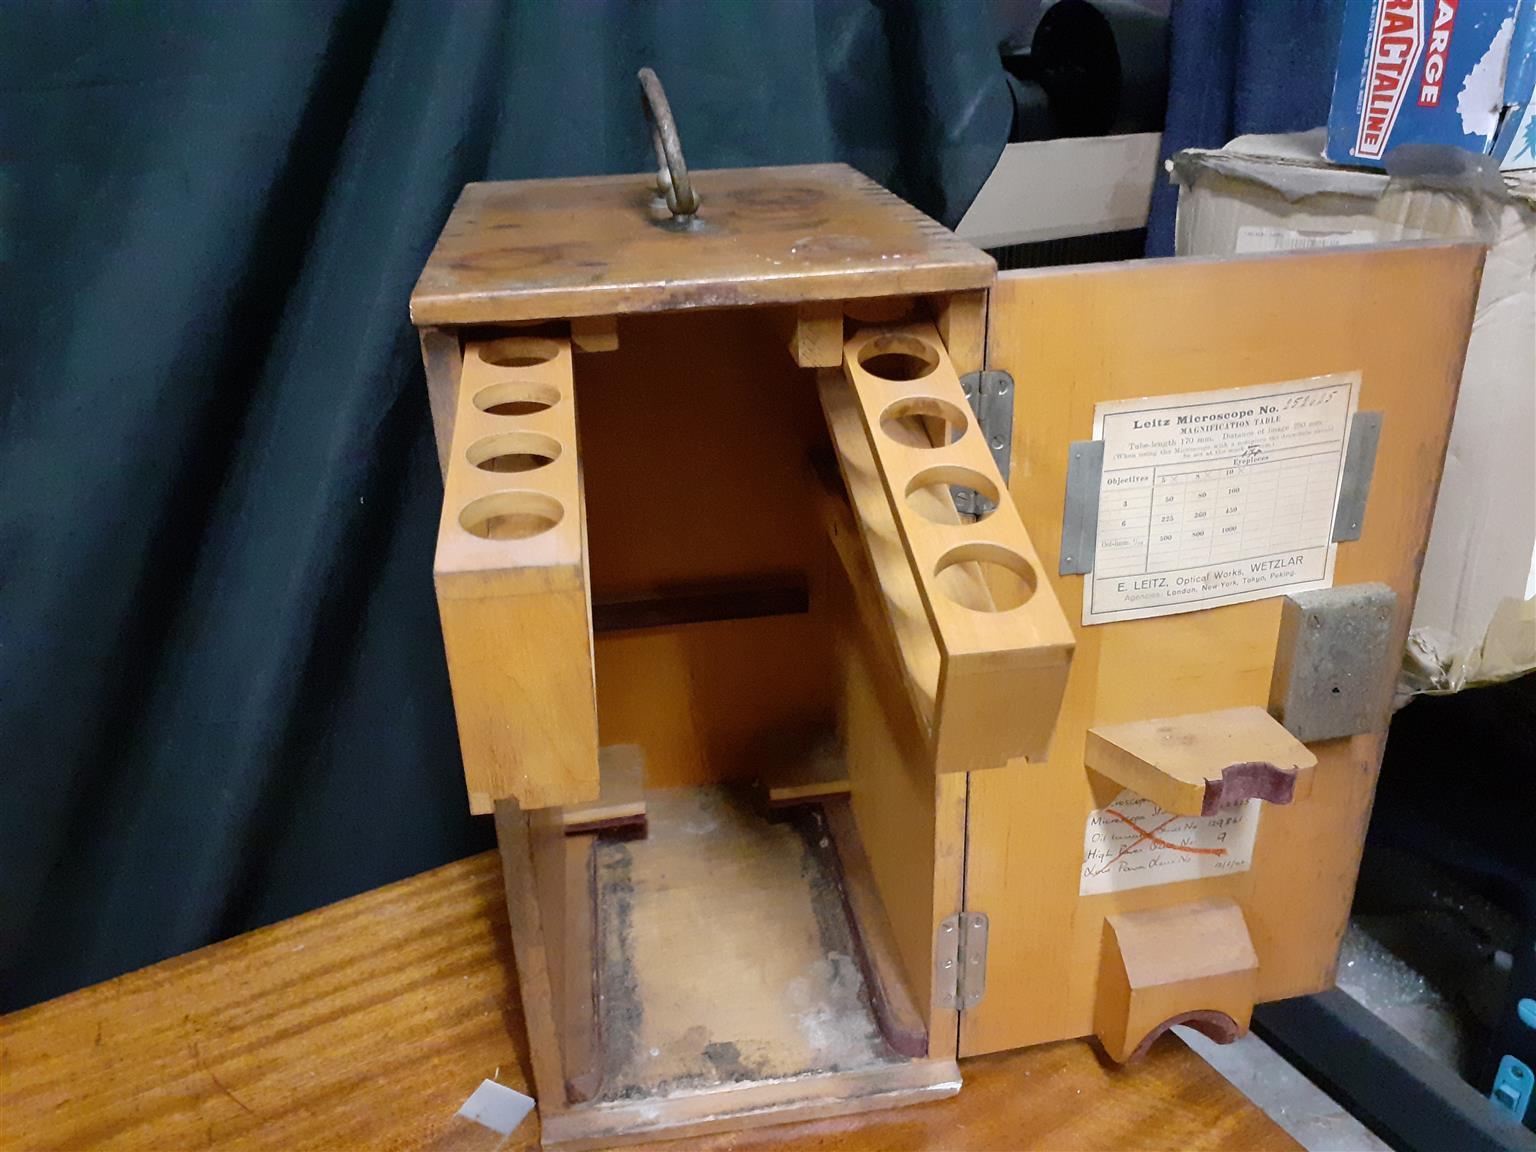 Antique - Ernest Leitz Wetzlar Microscope